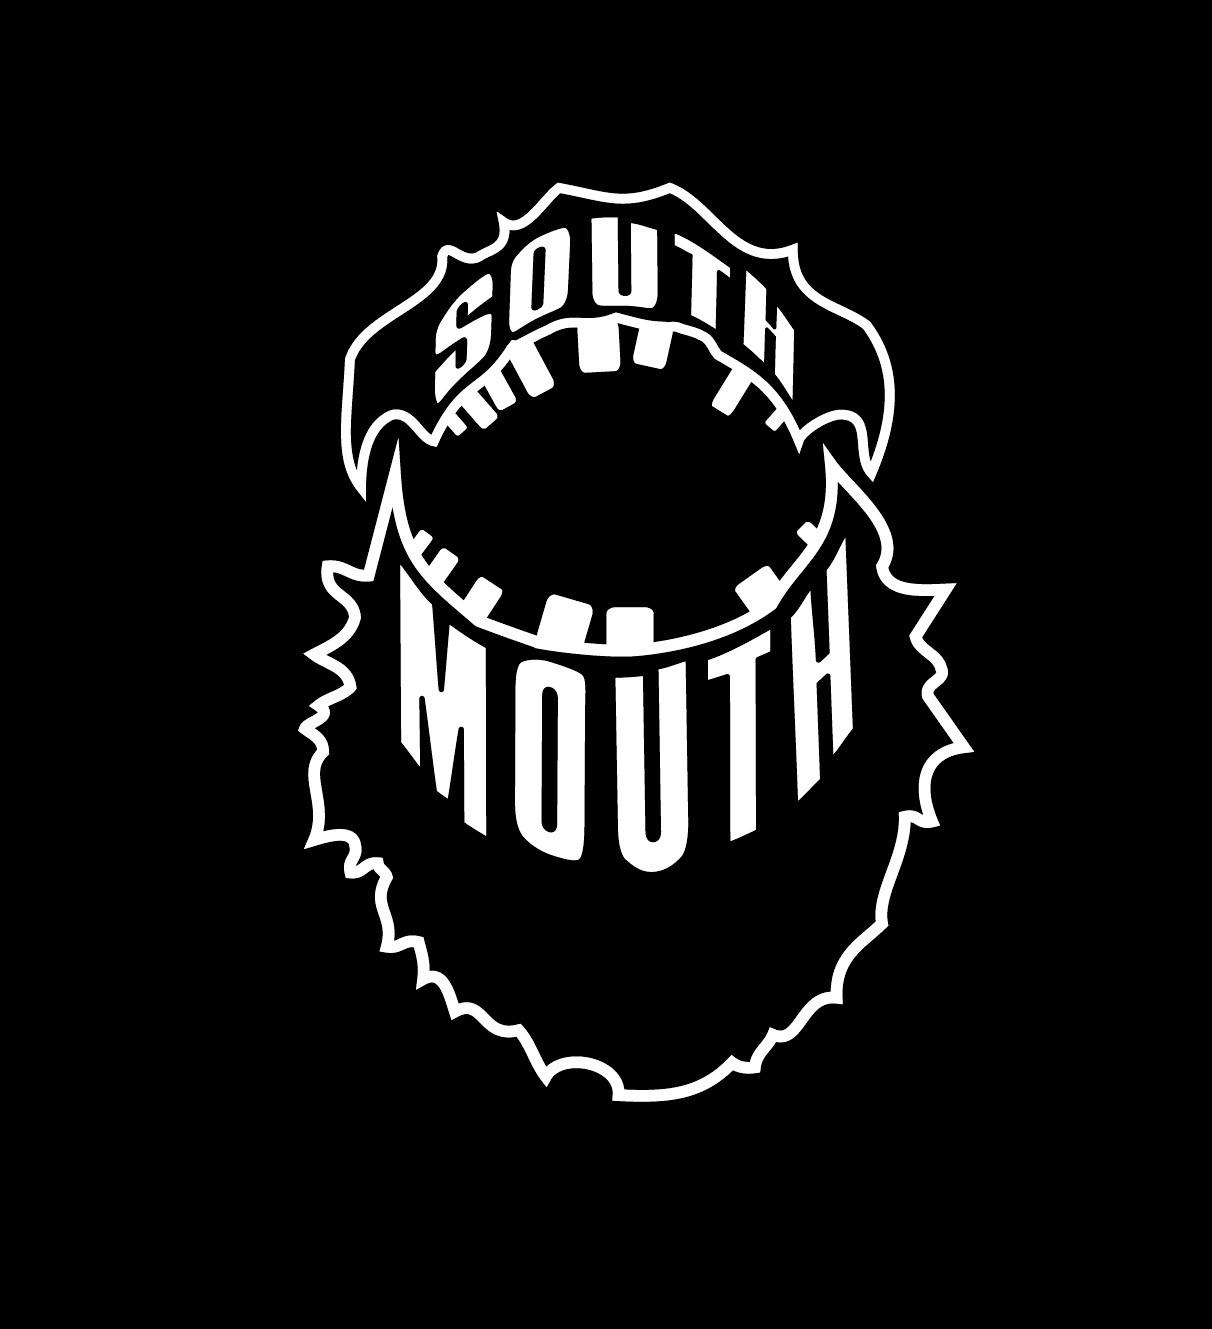 SouthMouthLogo.jpg